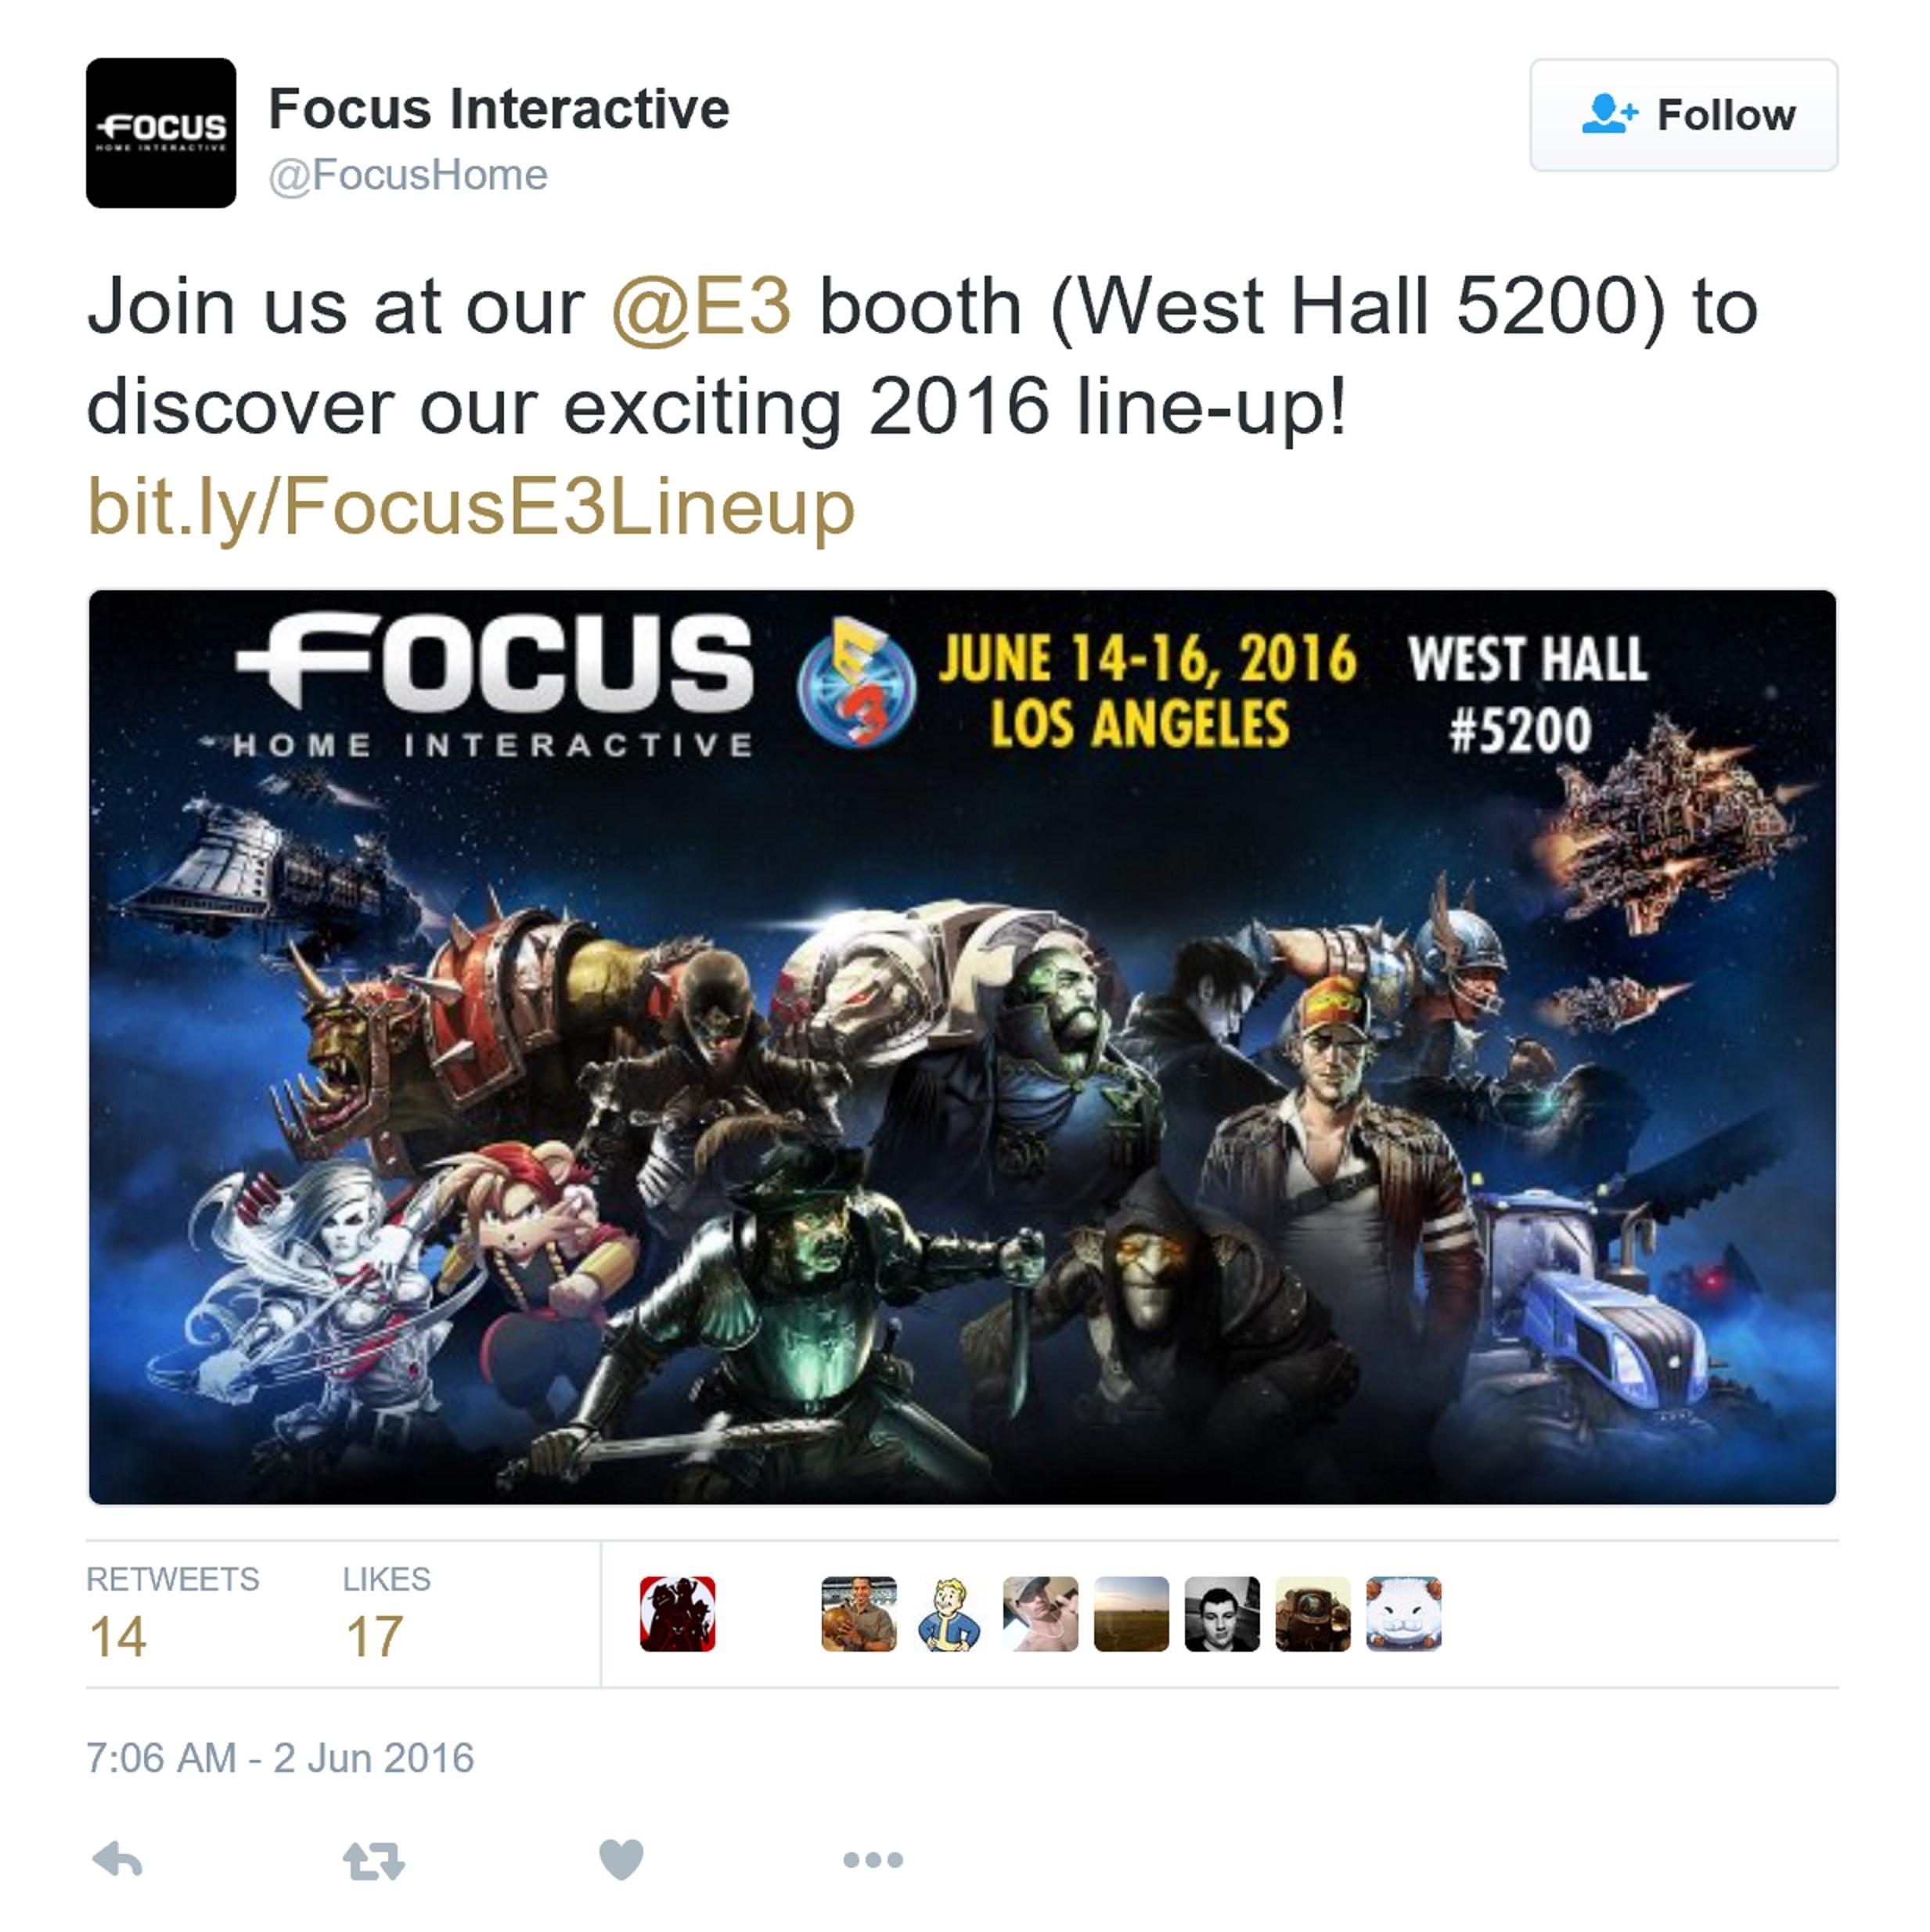 Focus公布E3 2016参展名单